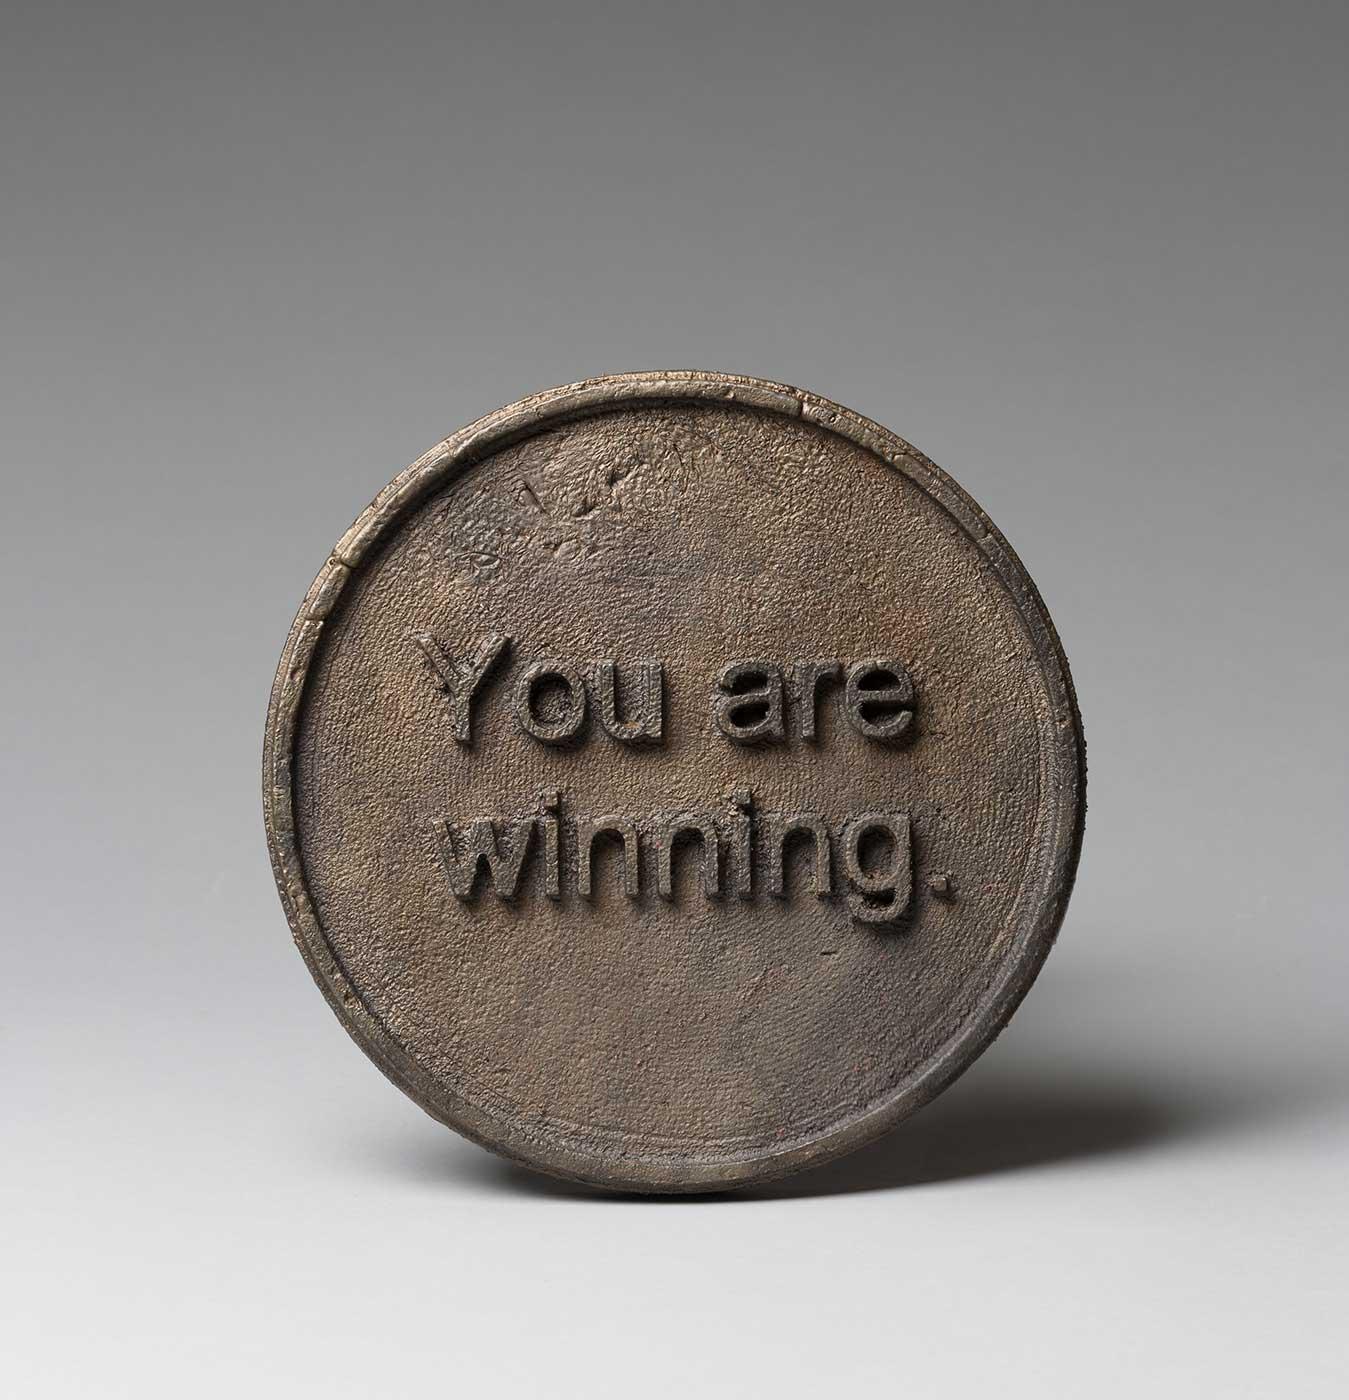 Sophie Eisner - You Are Winning